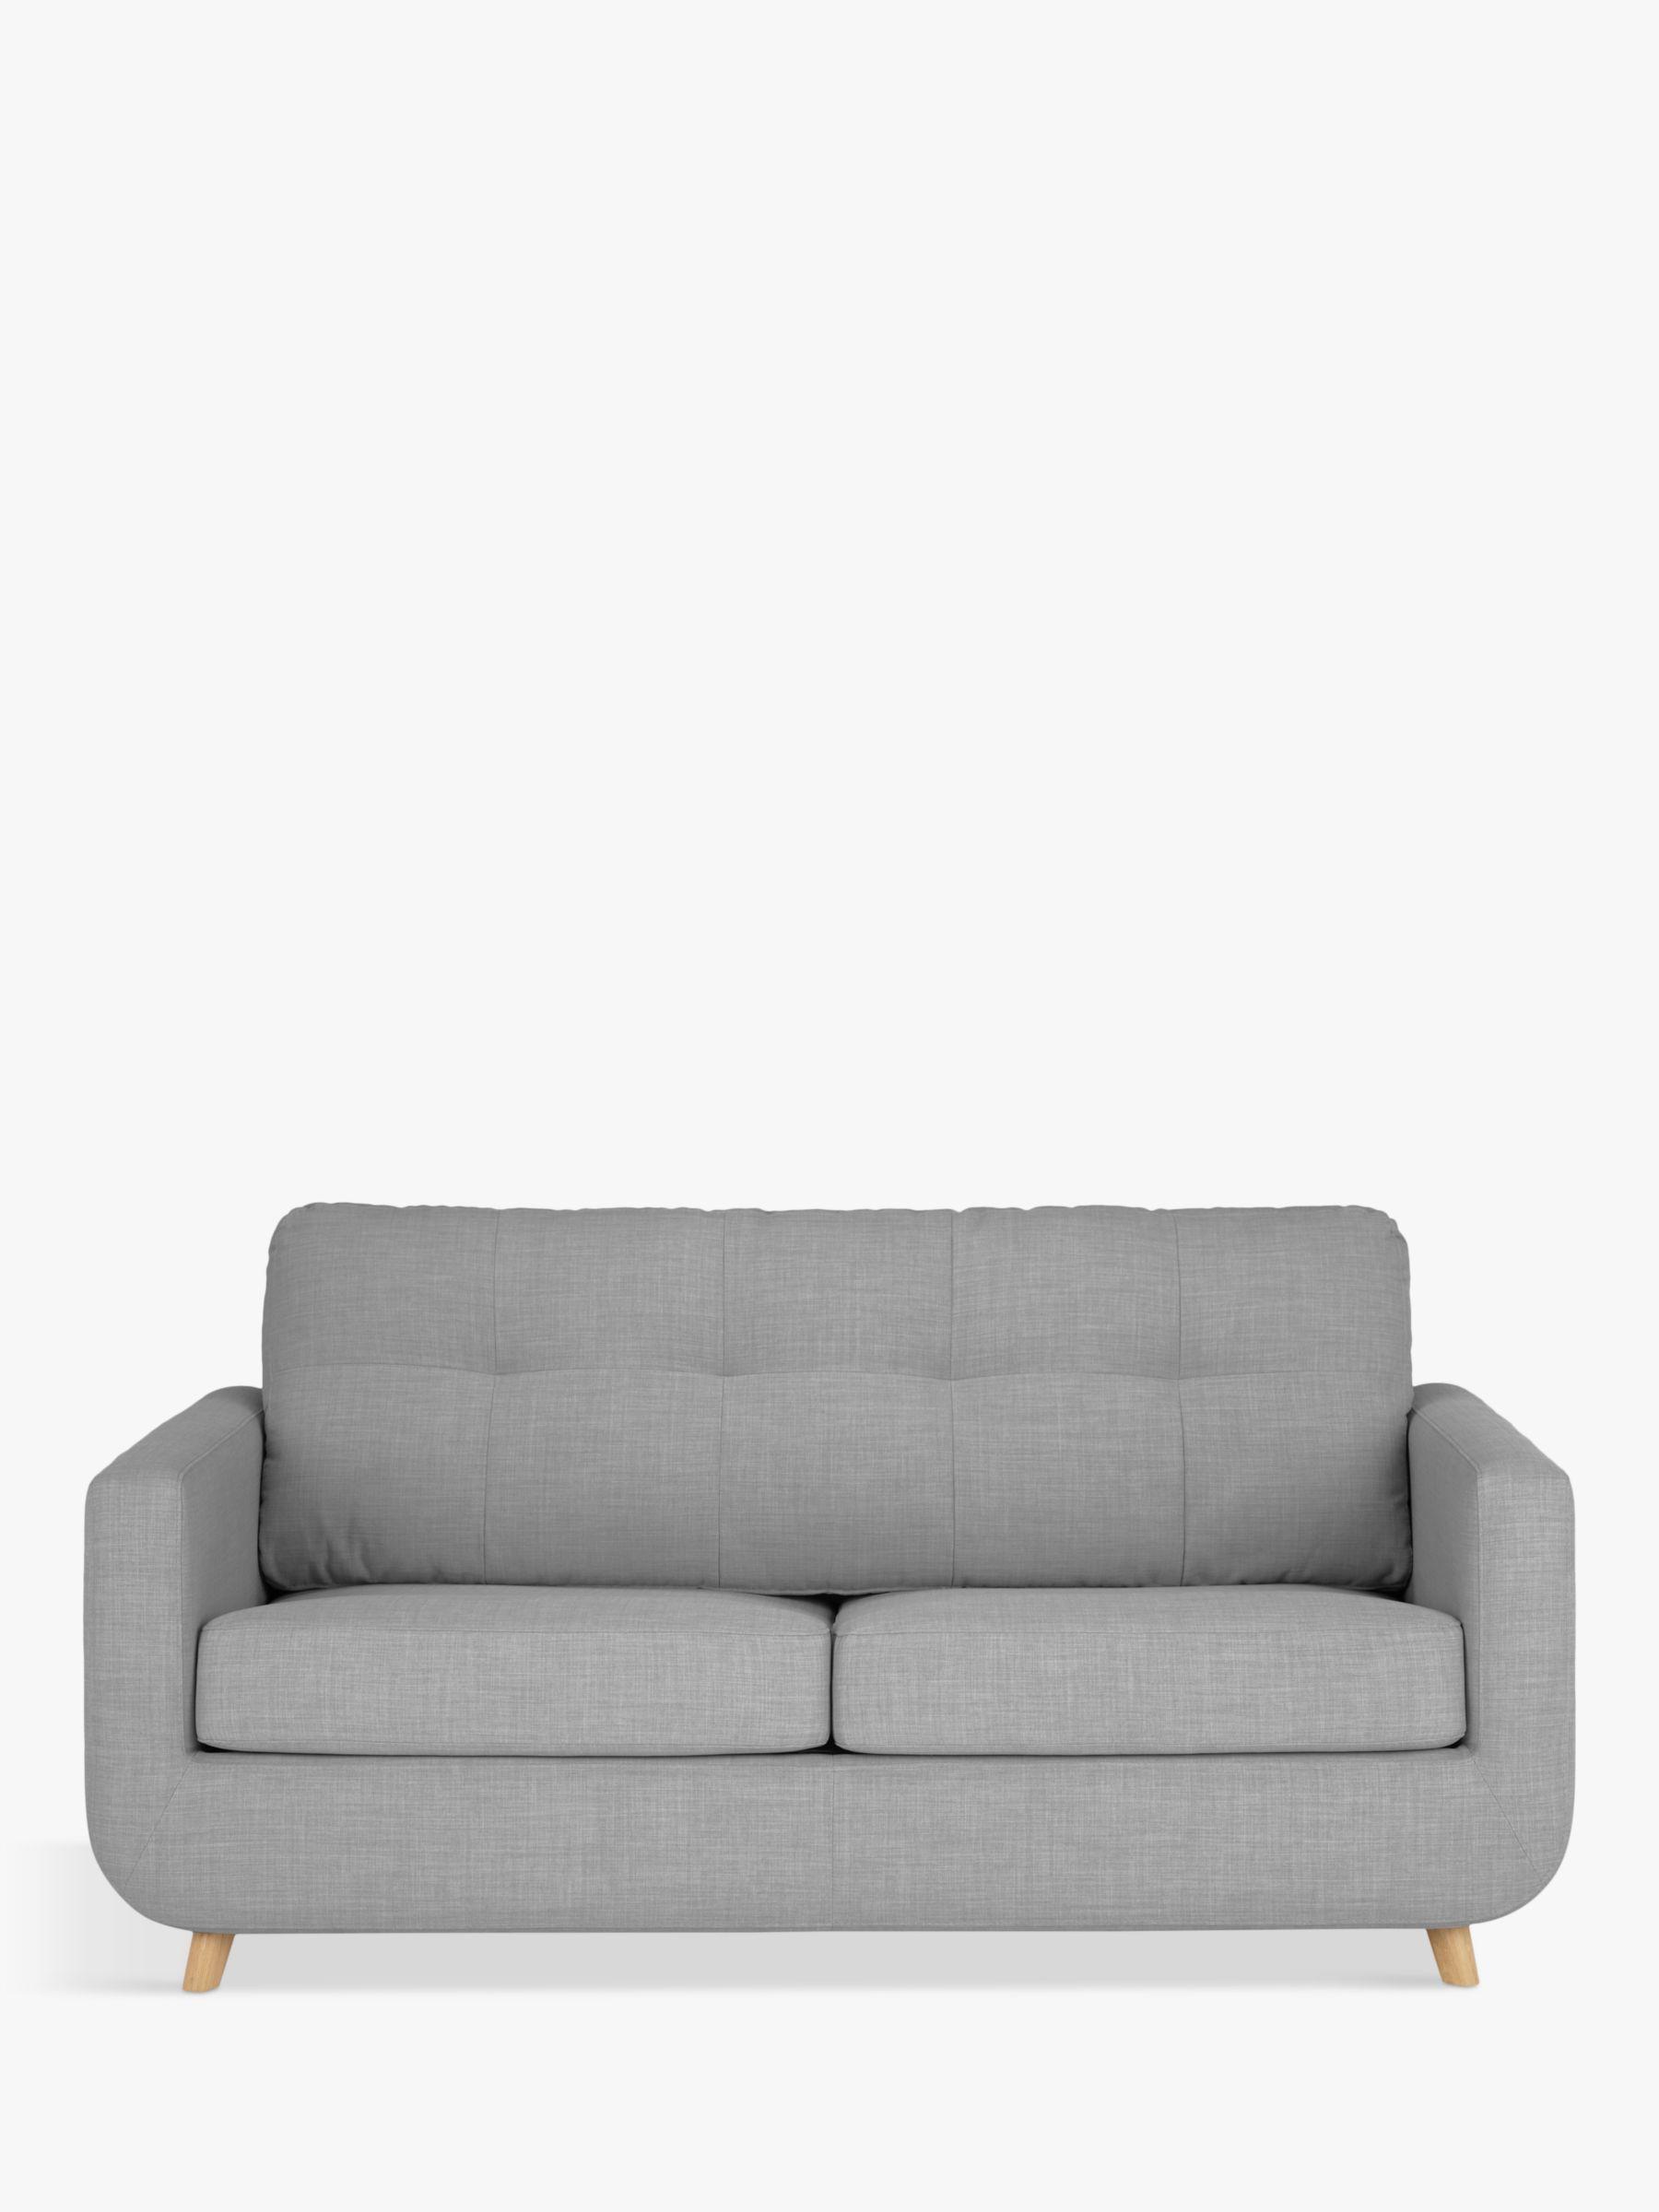 John Lewis Partners Barbican Medium 2 Seater Sofa Bed Light Leg Connie Grey In 2020 2 Seater Sofa Sofa Sofa Bed